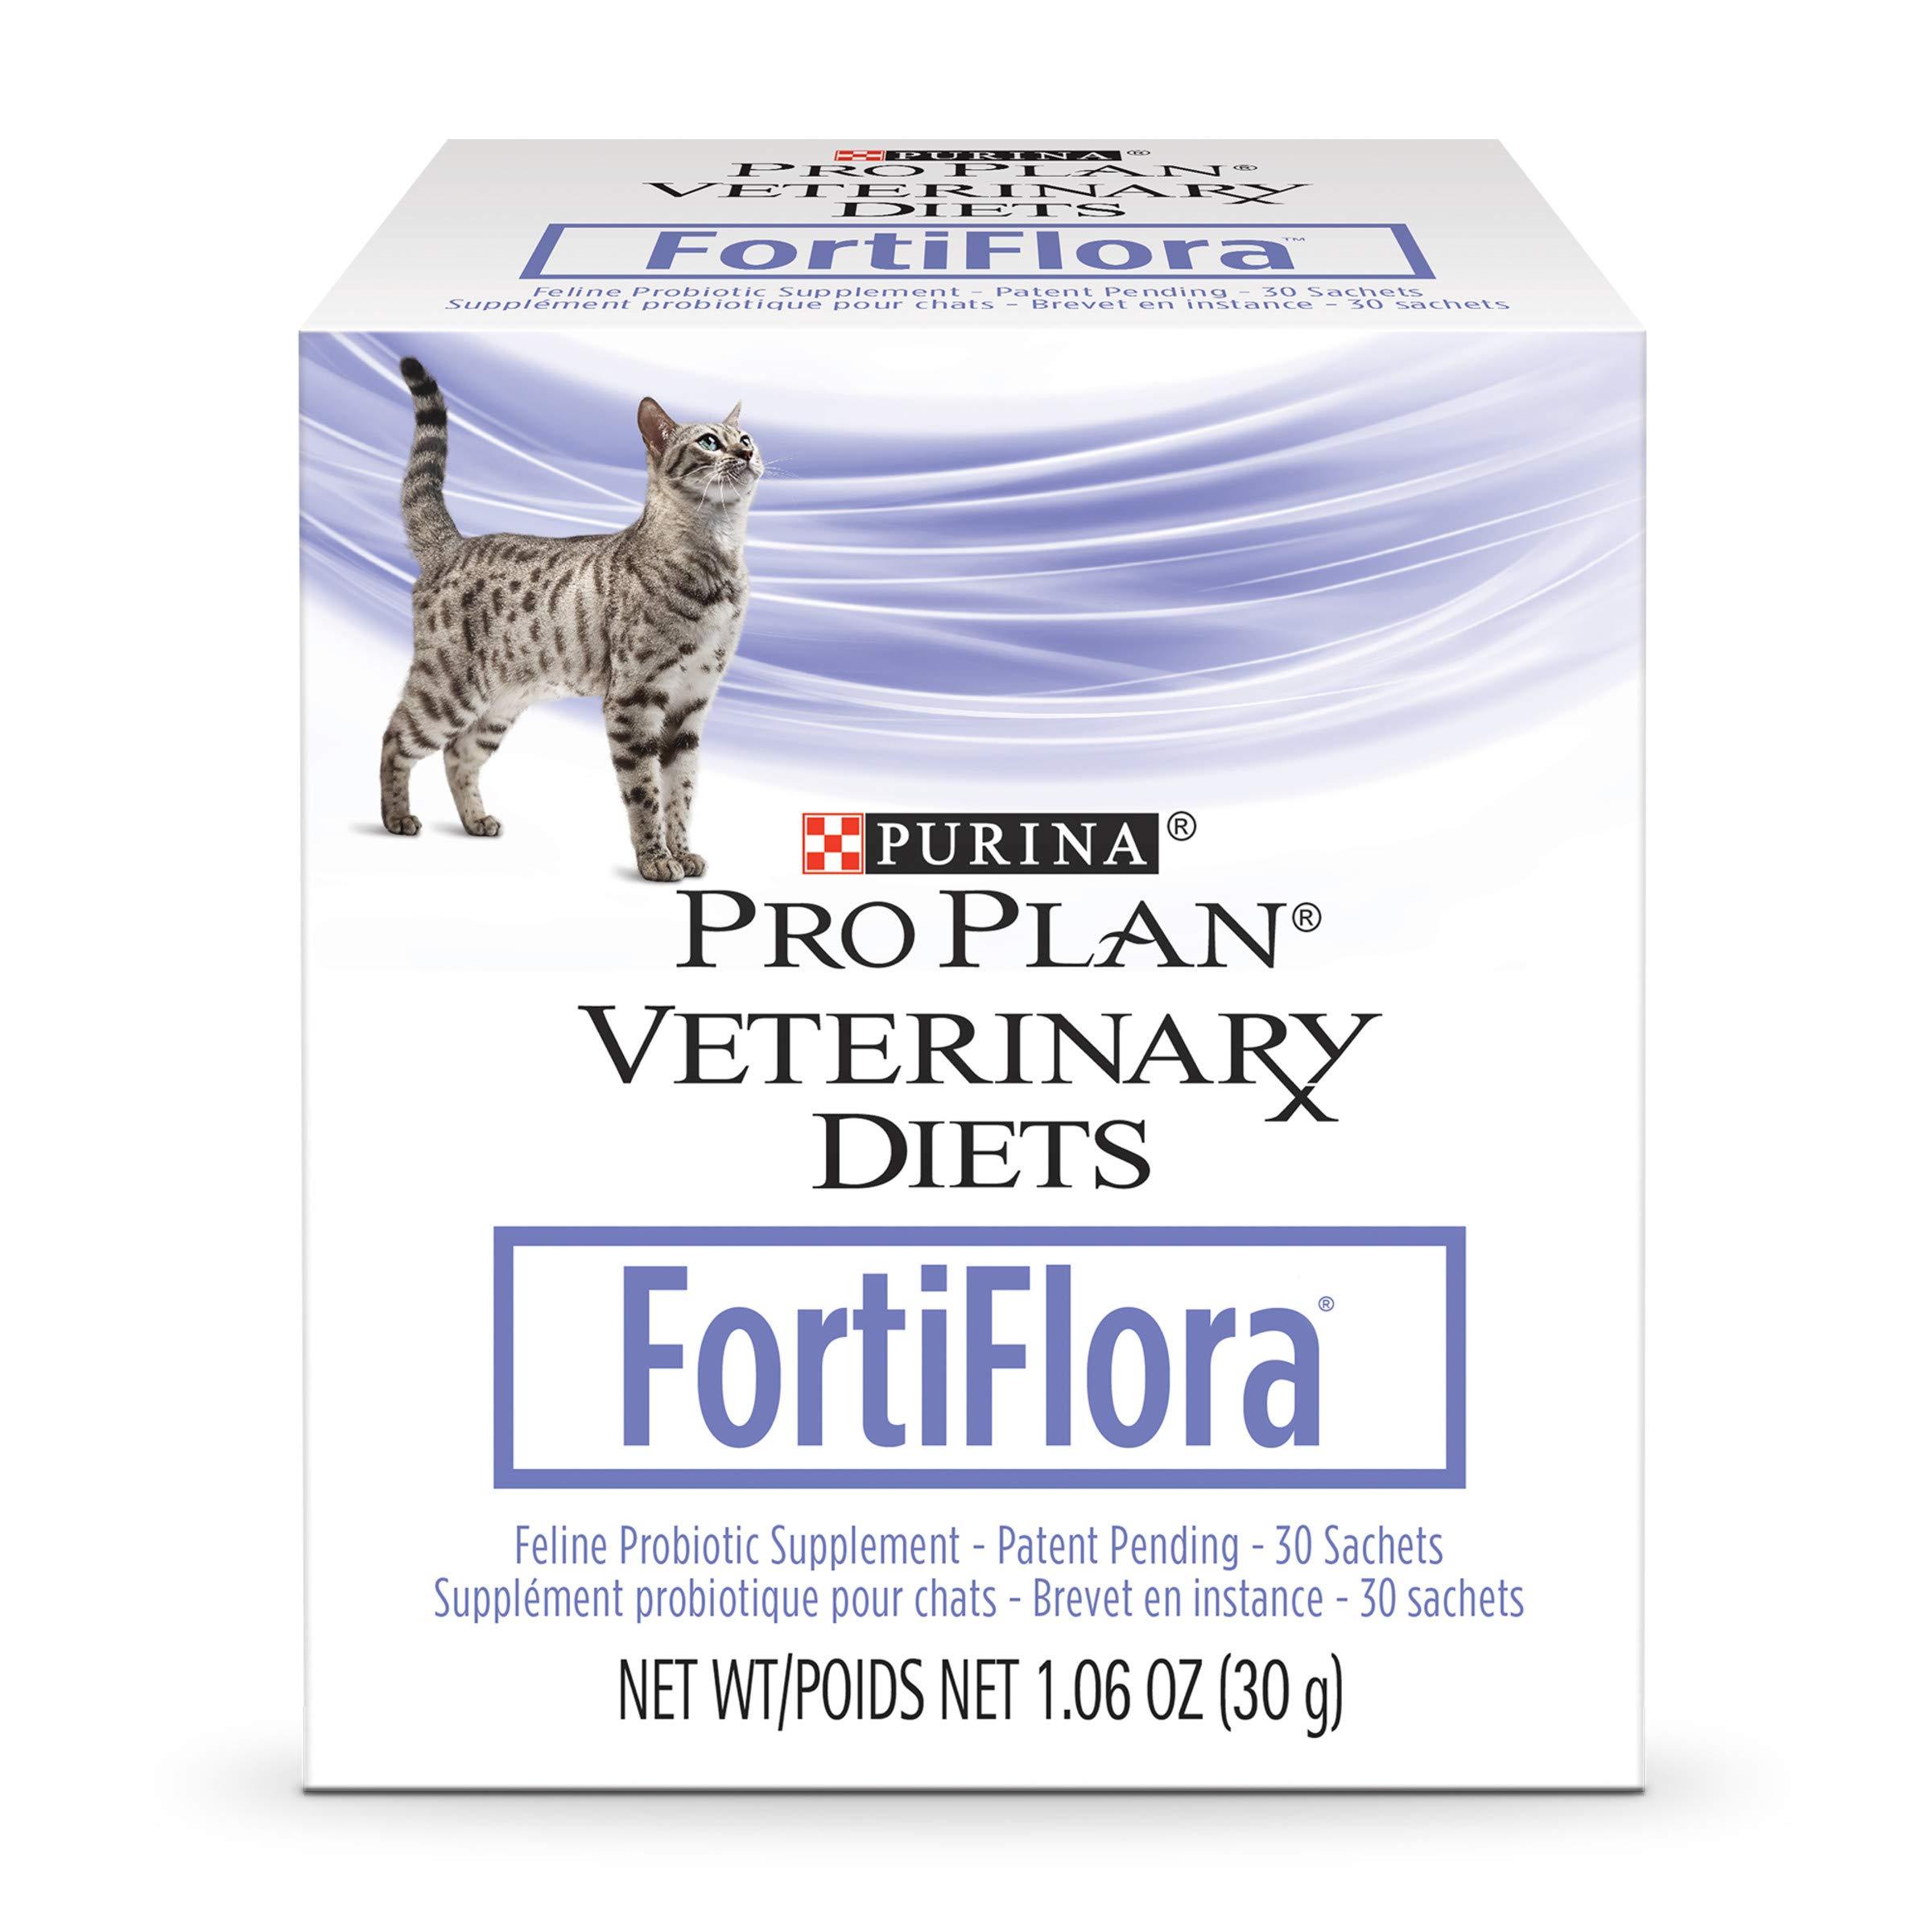 Purina Pro Plan Veterinary Diets Fortiflora Feline Nutritional Cat Supplement - 30 ct. Box